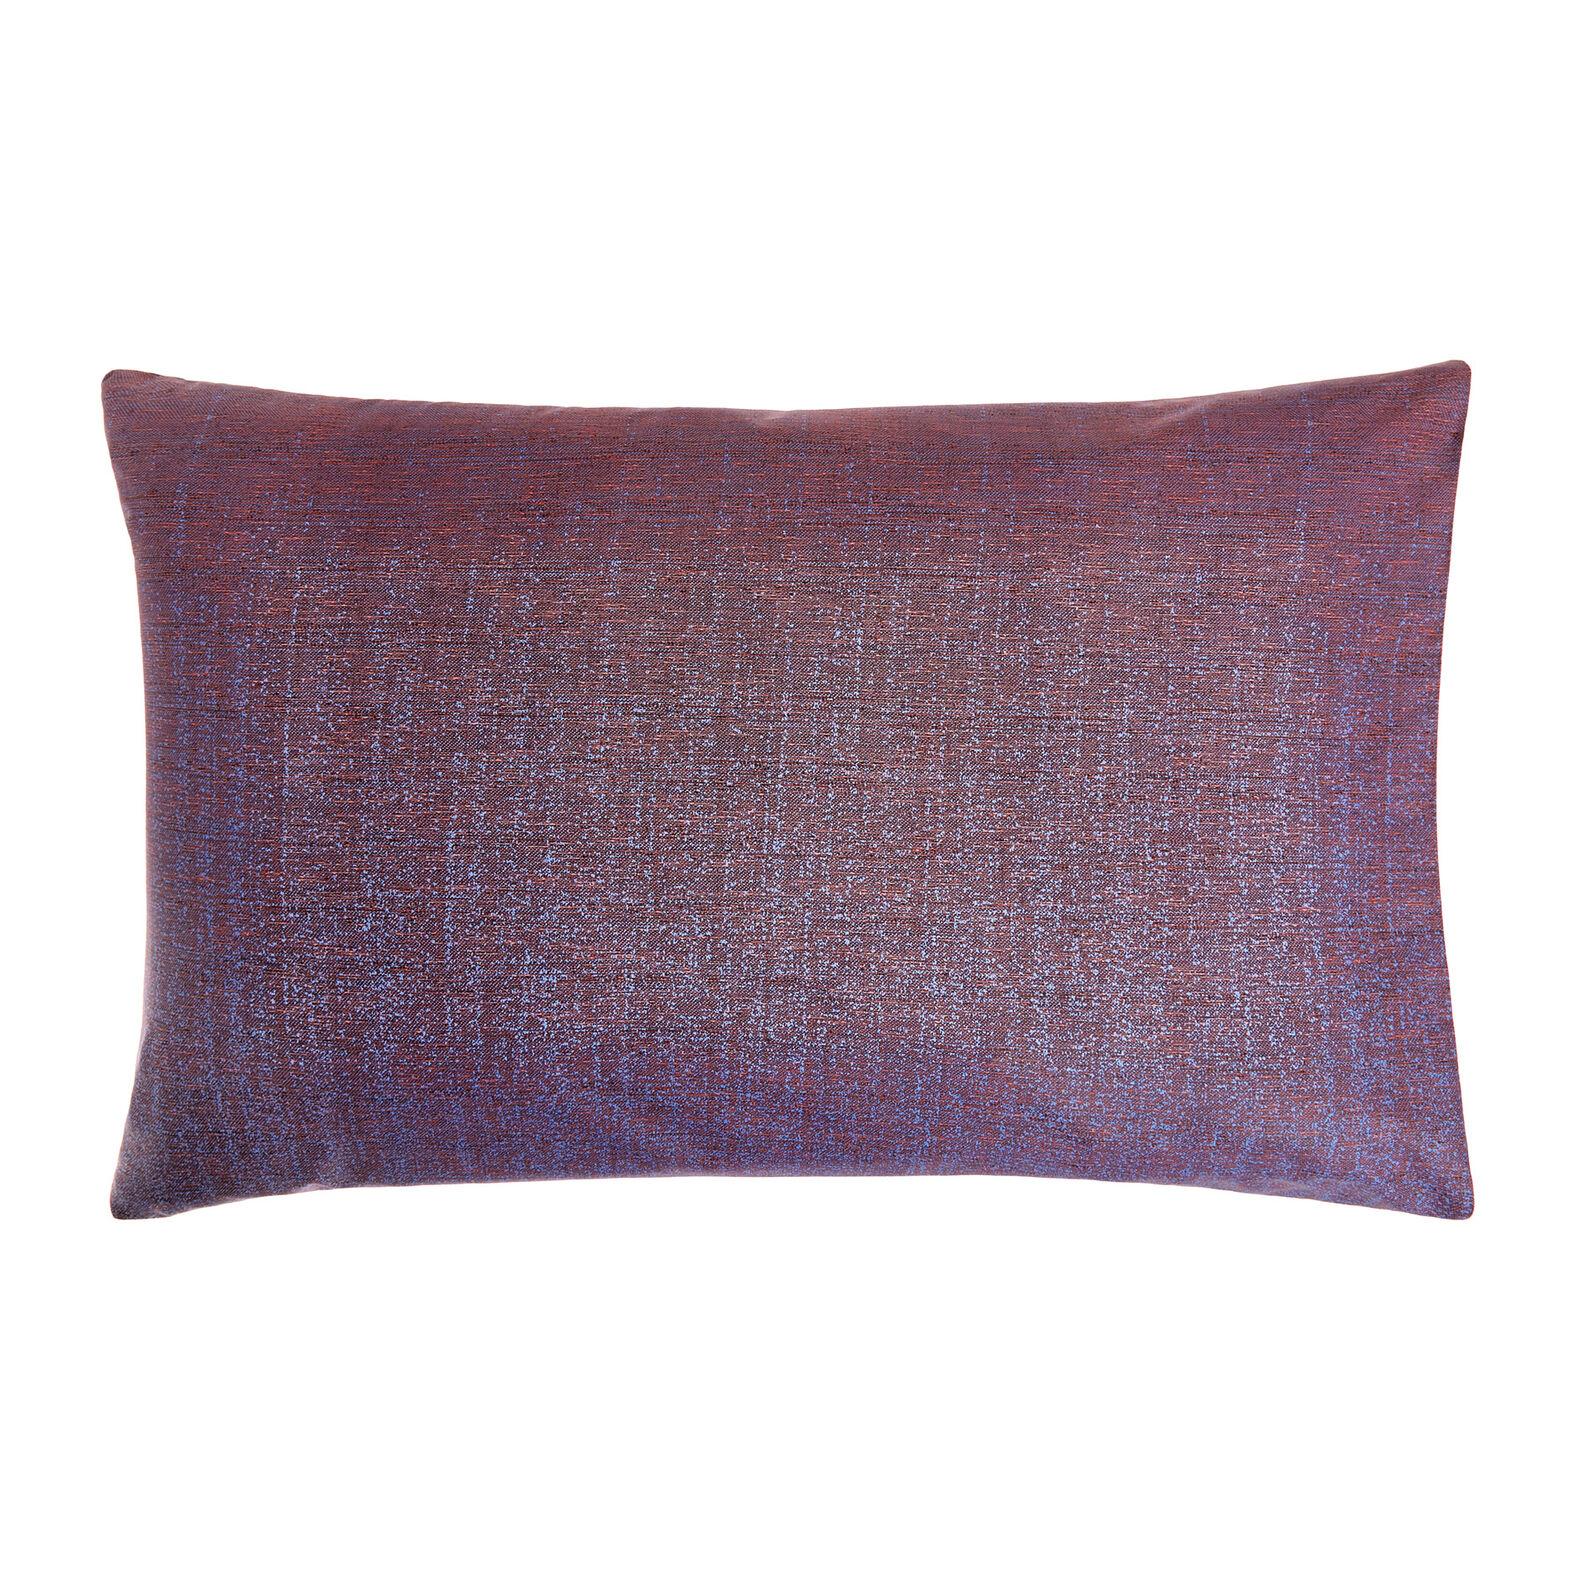 100% cotton pillowcase with digital print